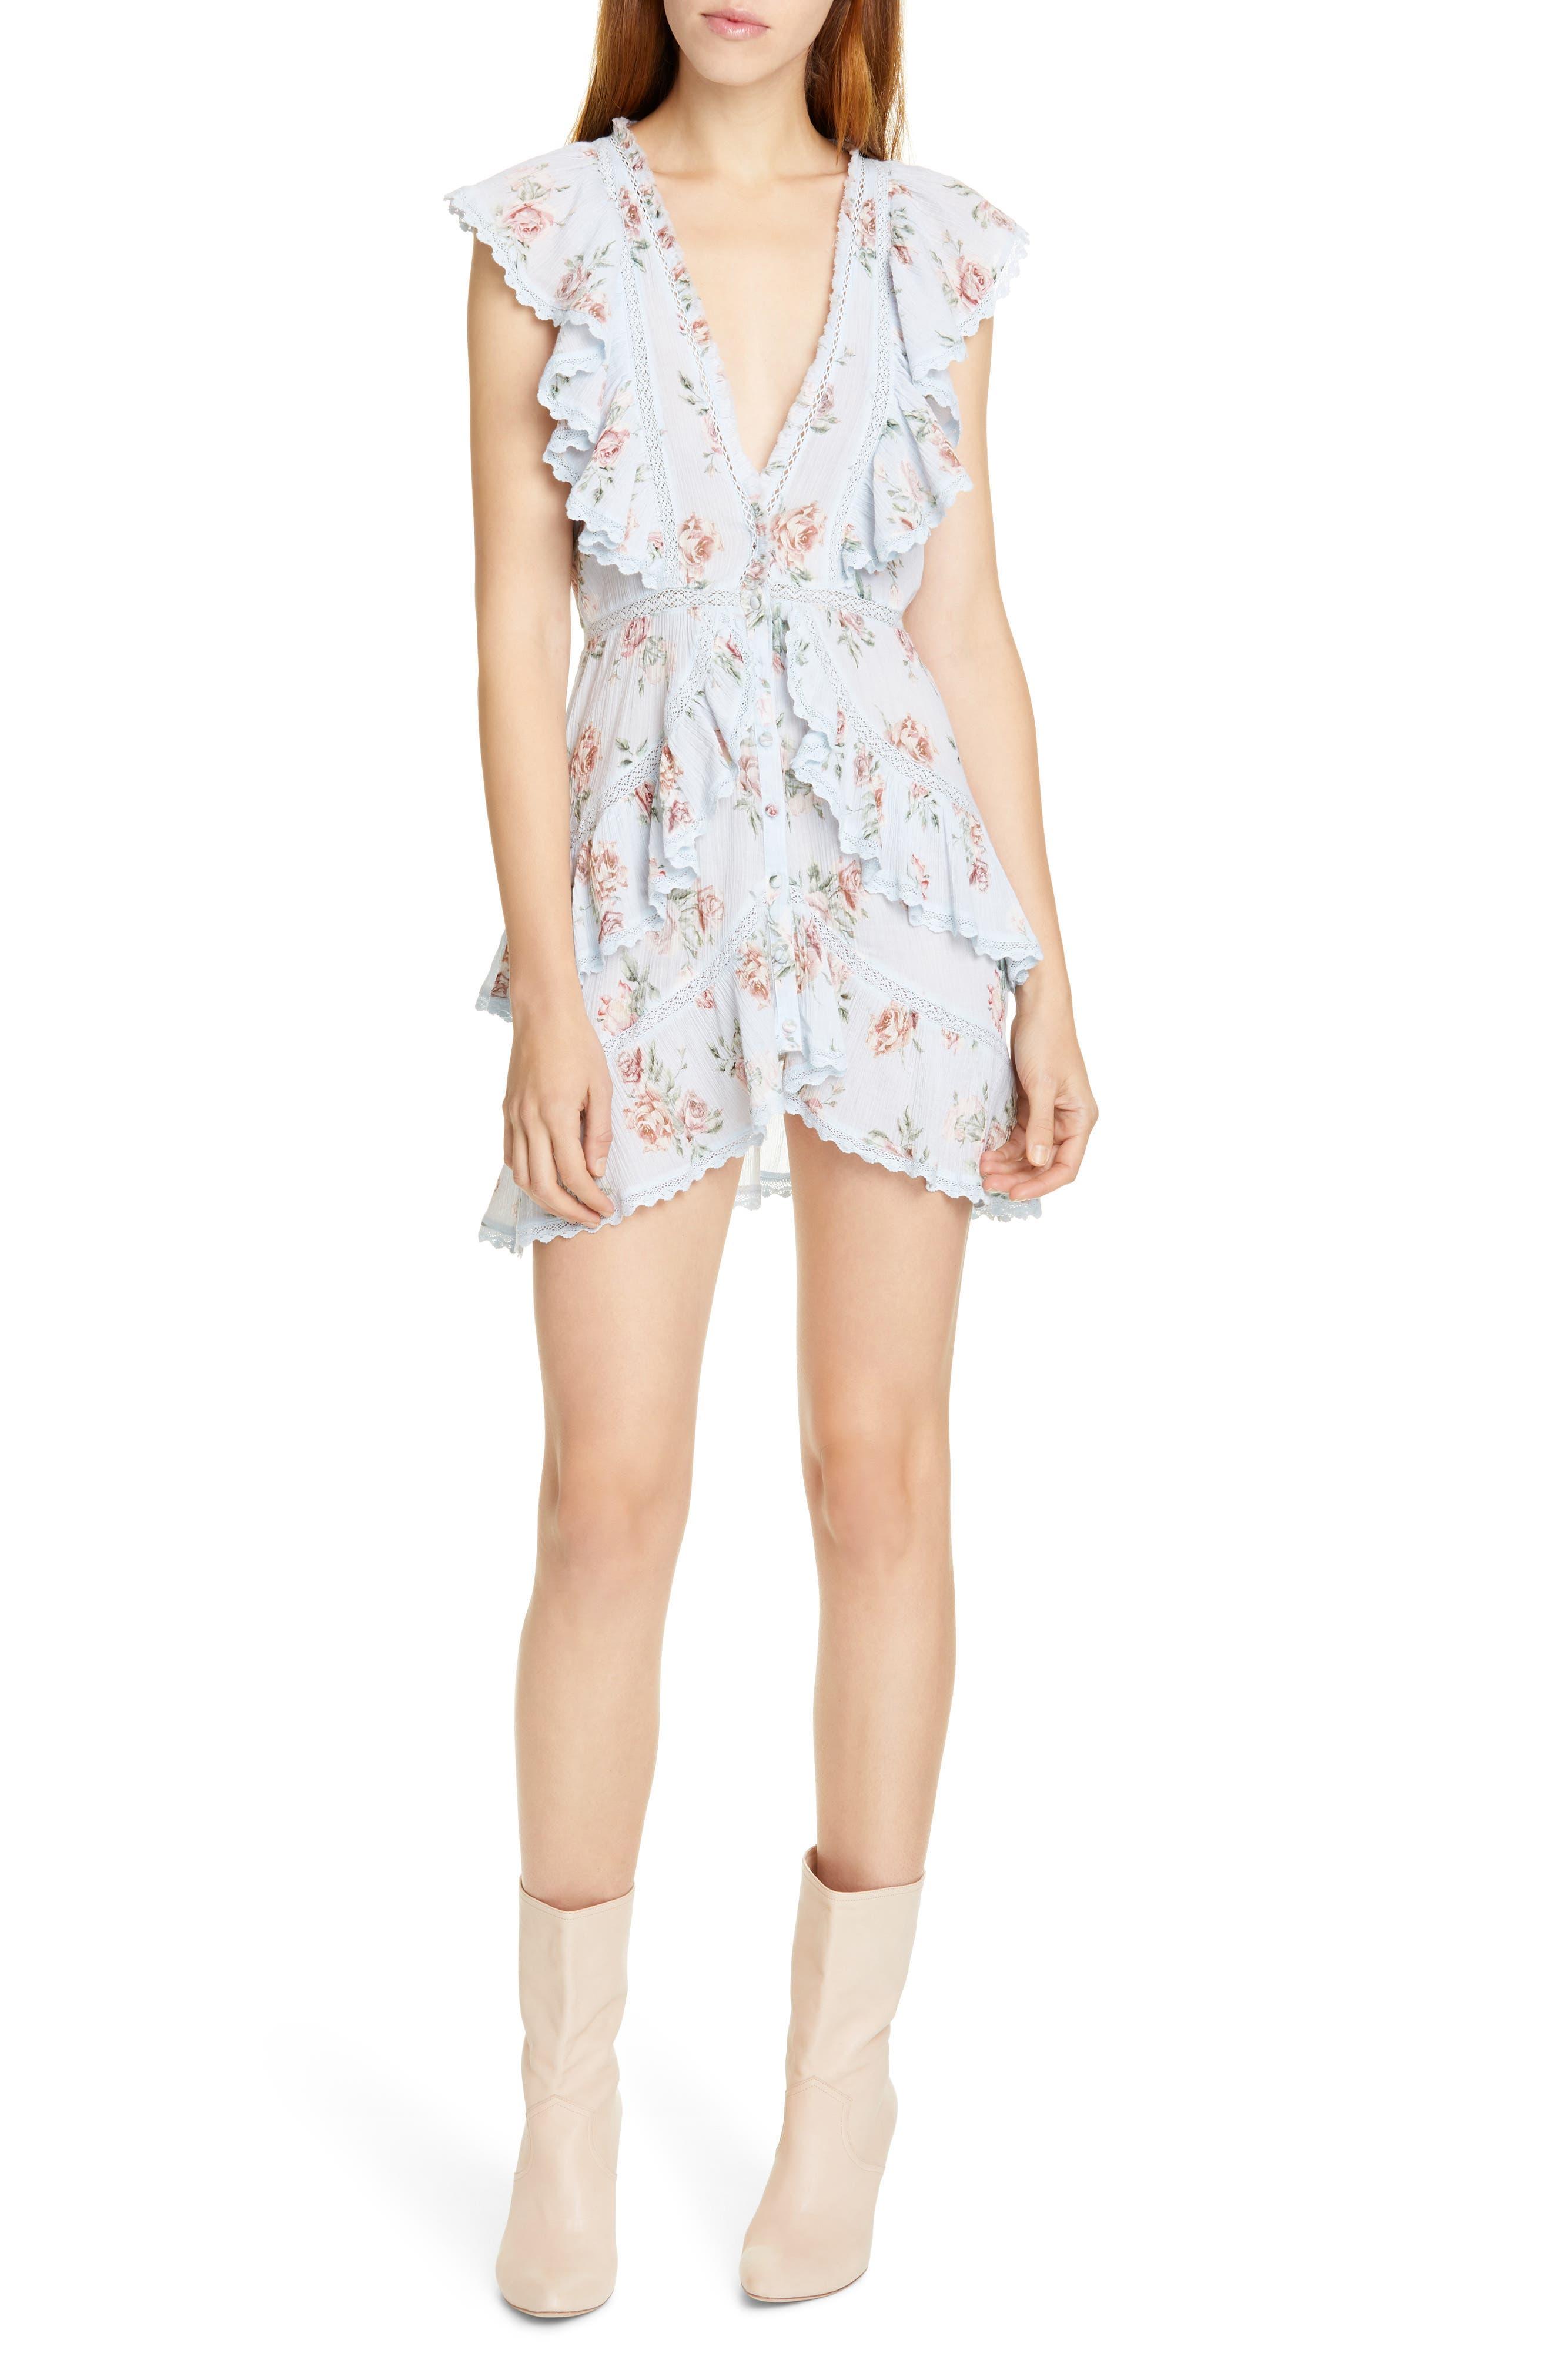 Loveshackfancy India Floral Lace & Ruffle Detail Cotton Minidress, Blue